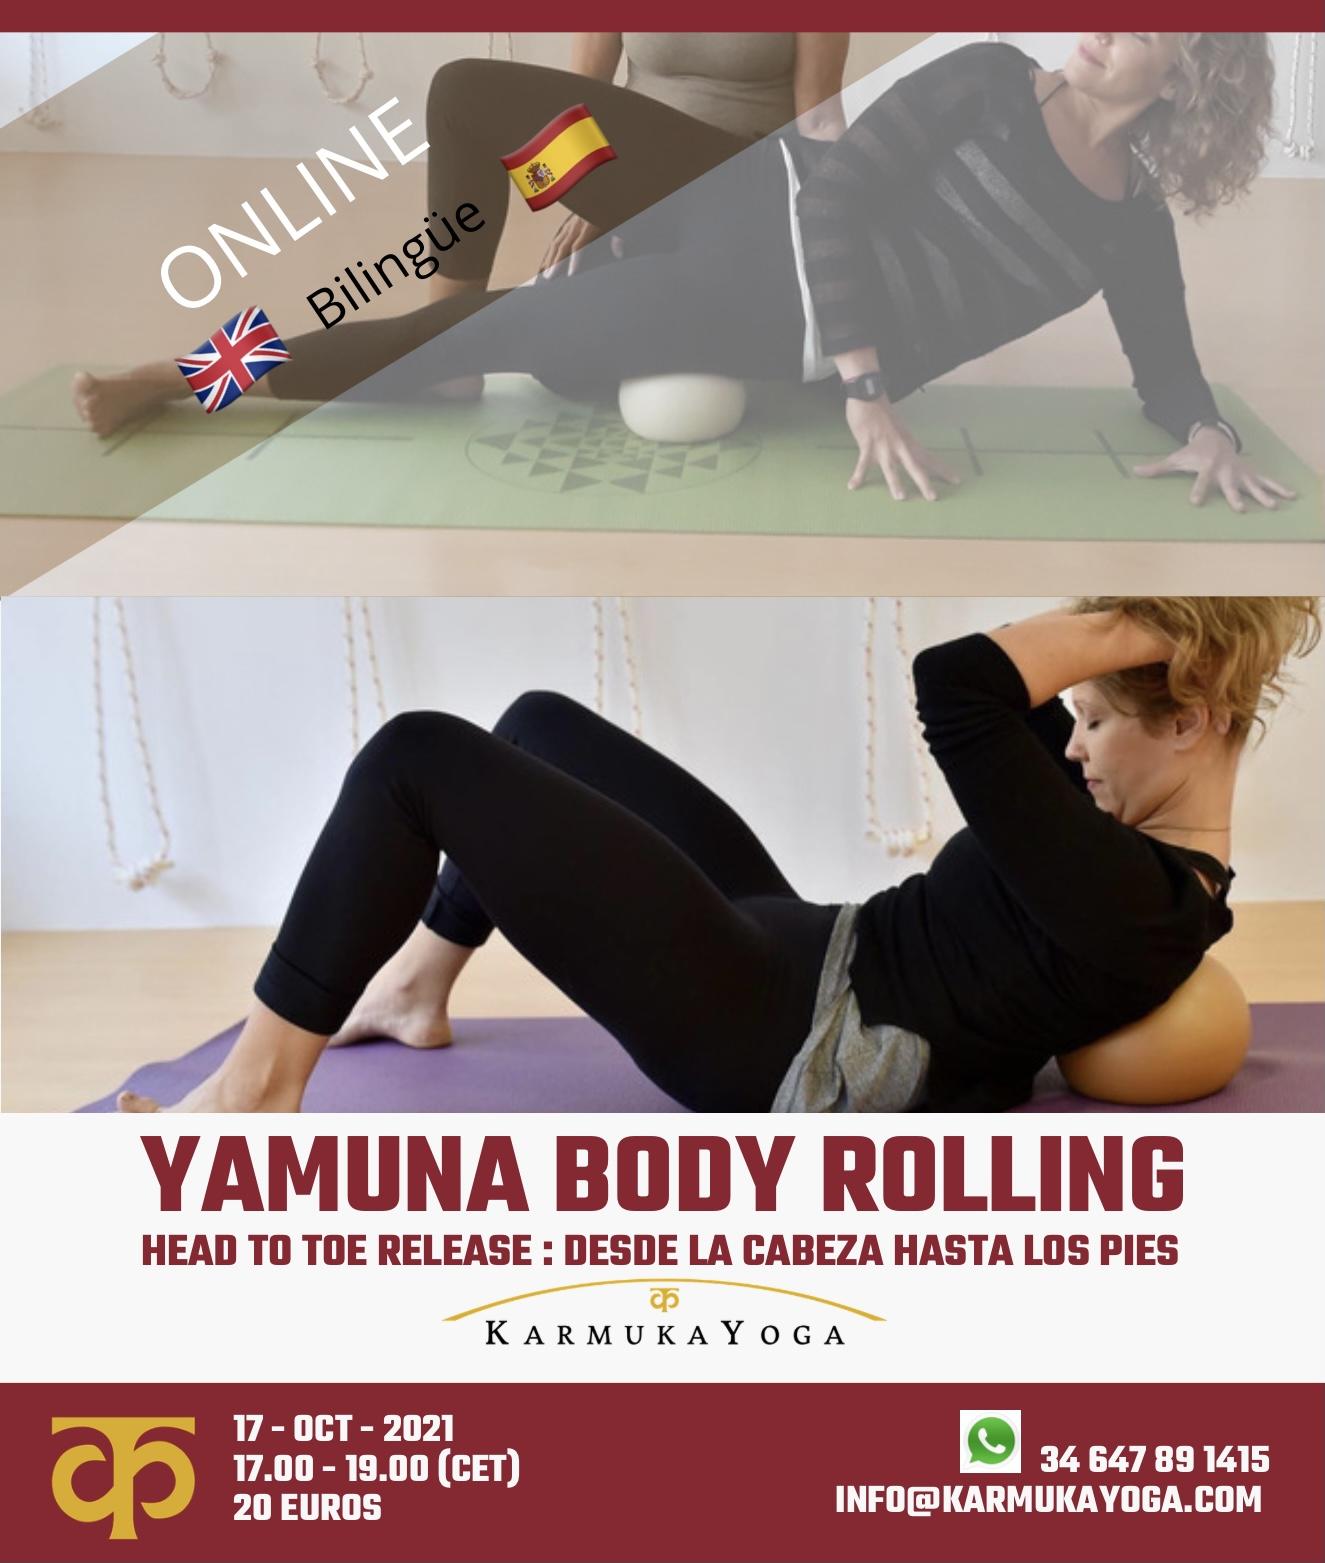 Yamuna Body Rolling from head to toe Karmuka Yoga